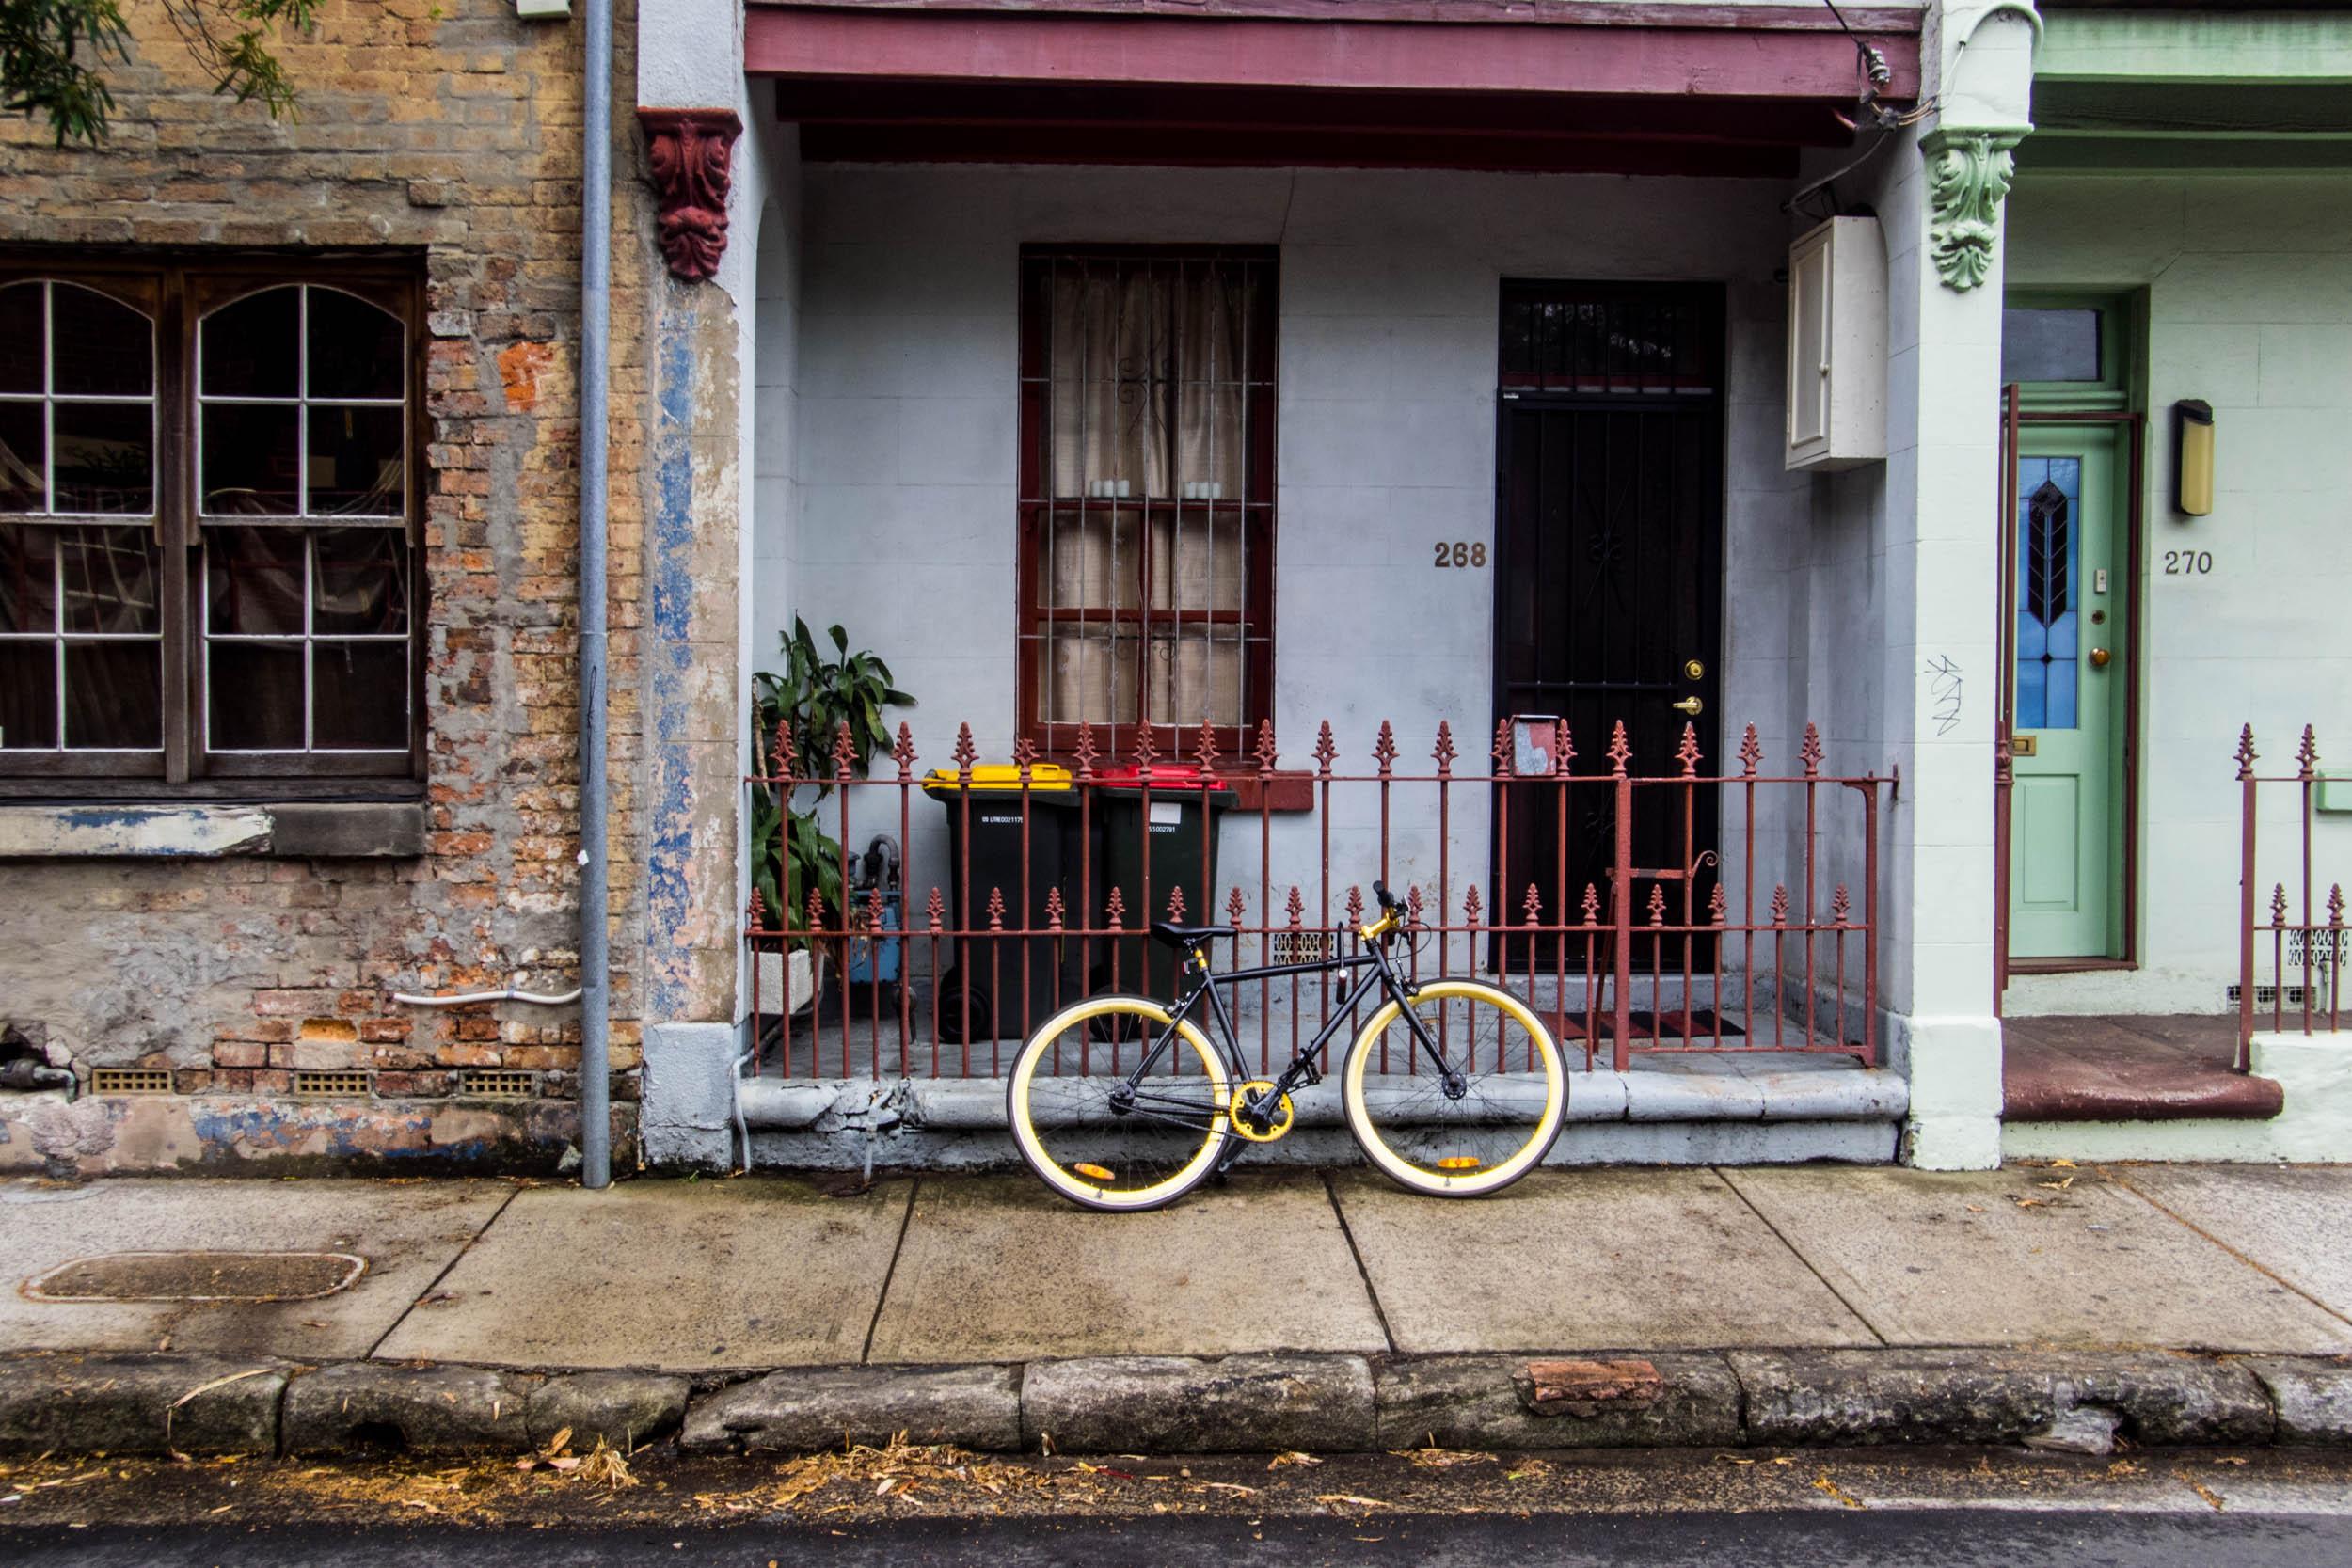 street photography courses sydney-1-6.jpg